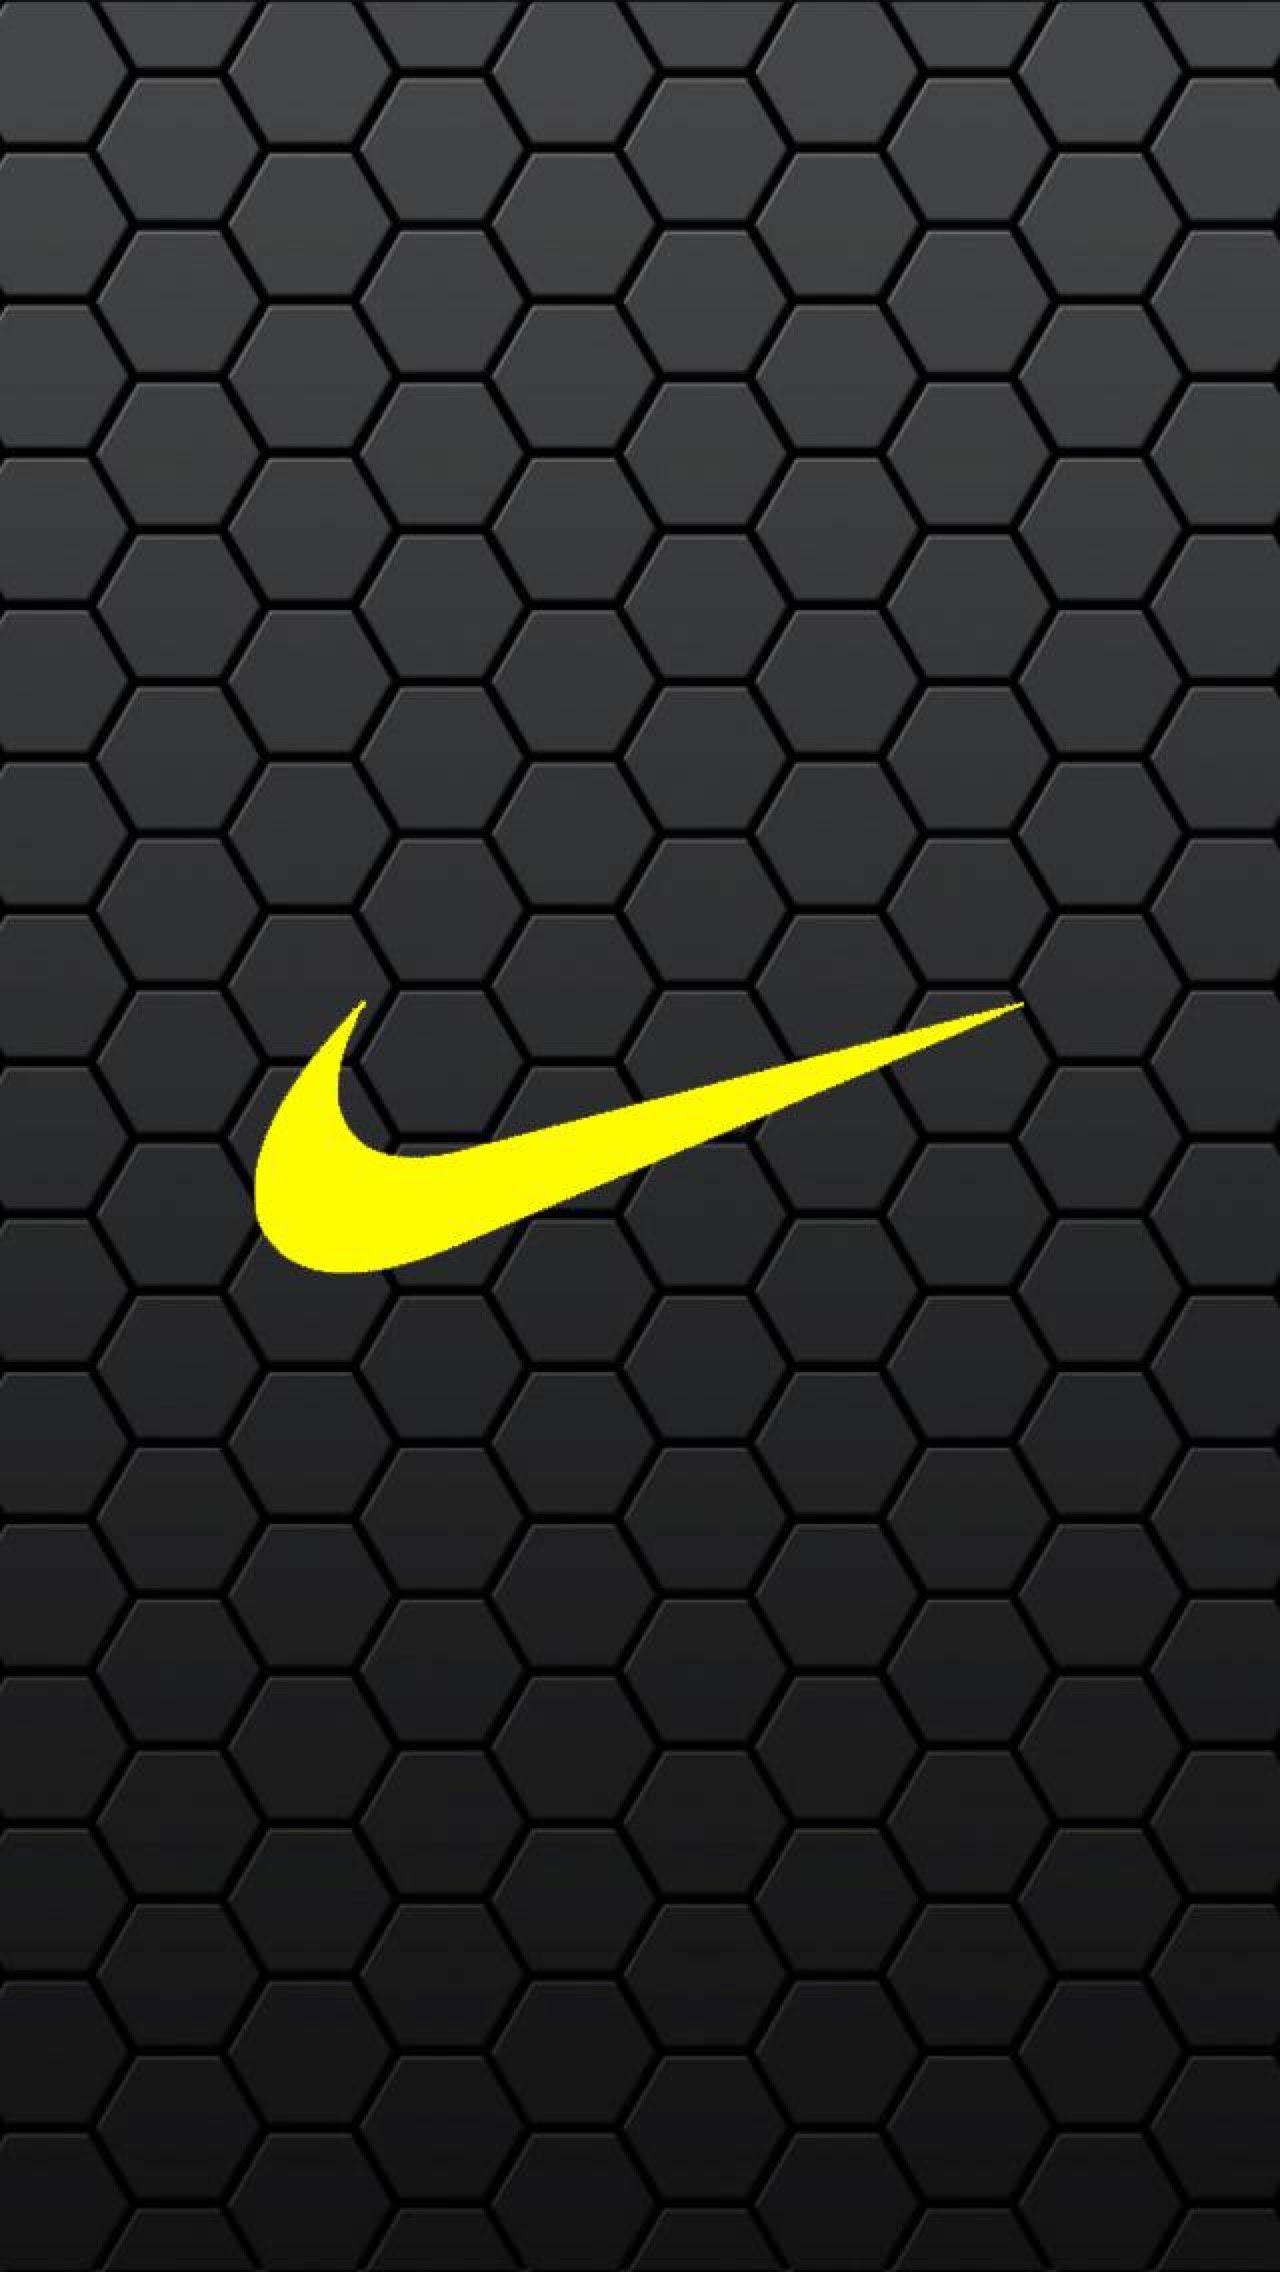 Pin By Ali On Yosoyturista Nike Logo Wallpapers Nike Wallpaper Nike